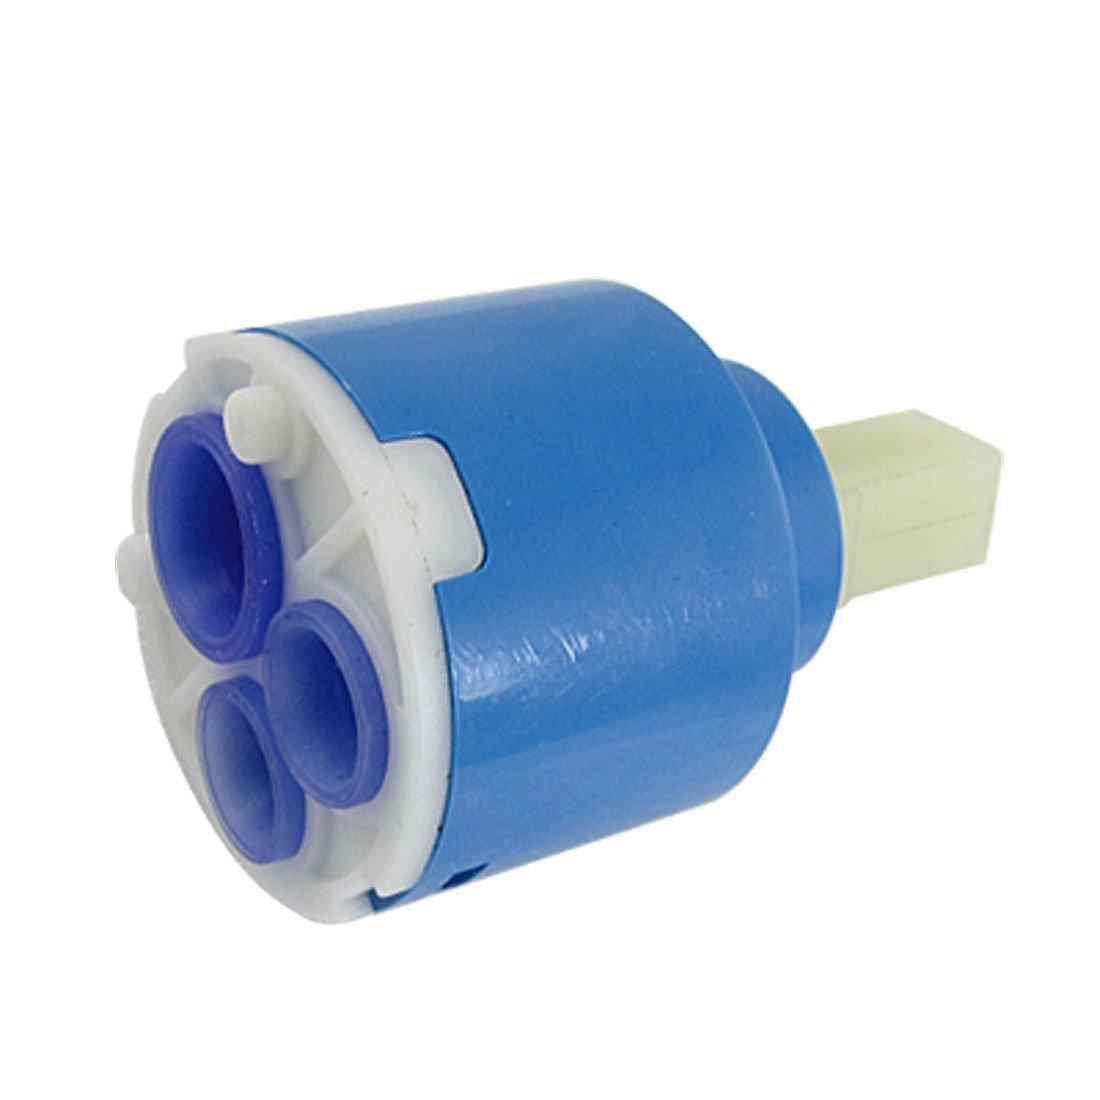 faucet water tap faucets ceramic cartridge valve blue ad. Black Bedroom Furniture Sets. Home Design Ideas